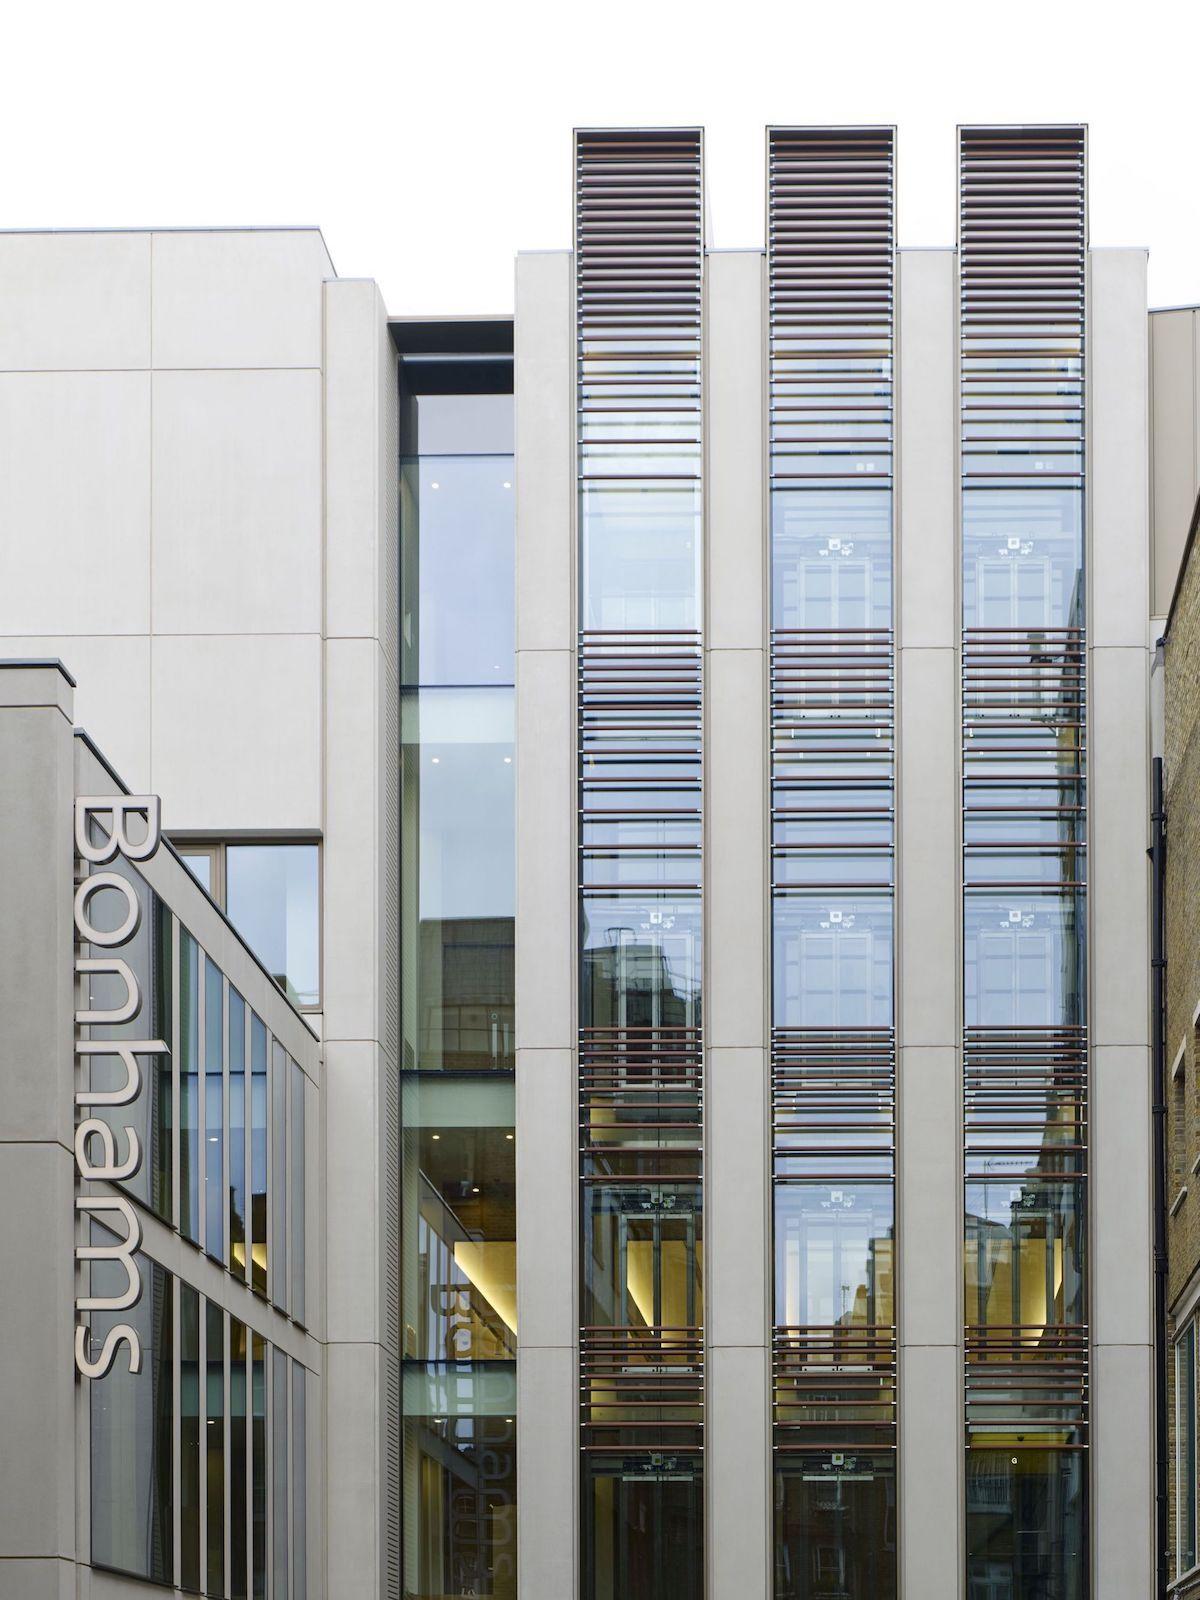 Bonhams headquarters in London. Photo courtesy Bonhams.